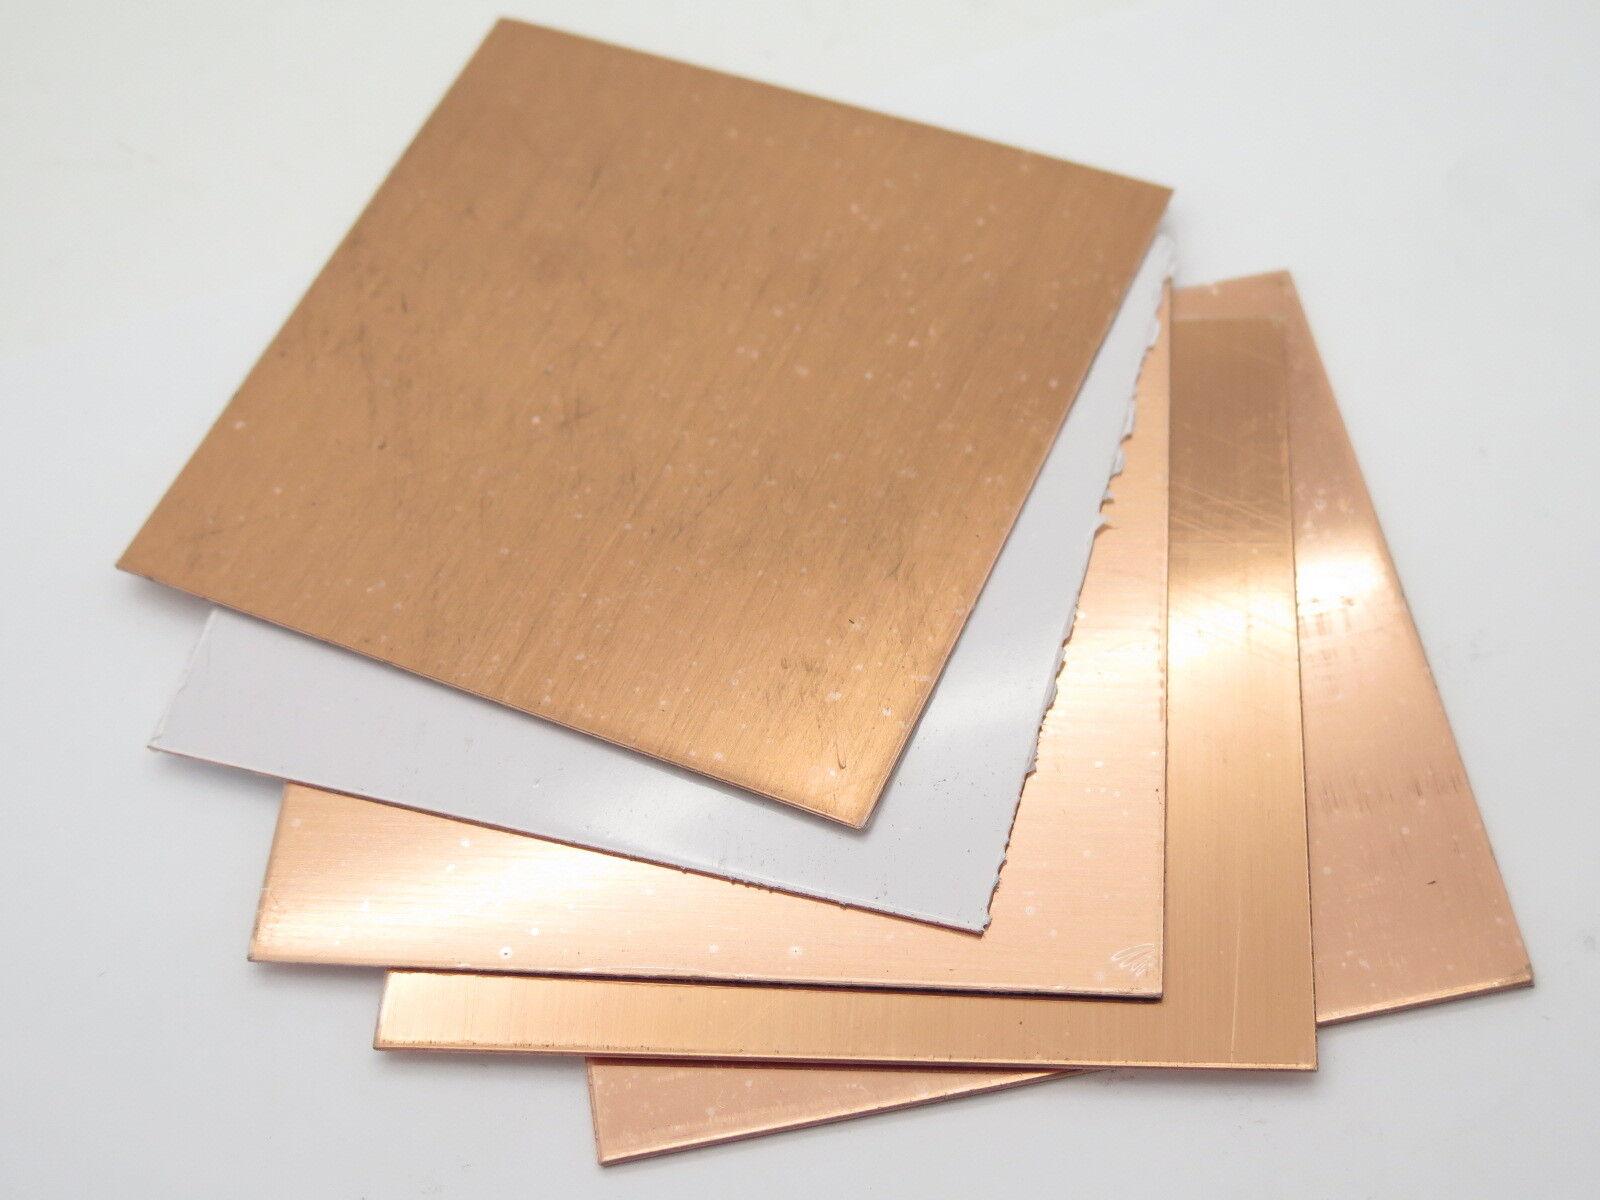 4 X 4 Copper Sheet Jewelry Craft Knife Making Handle